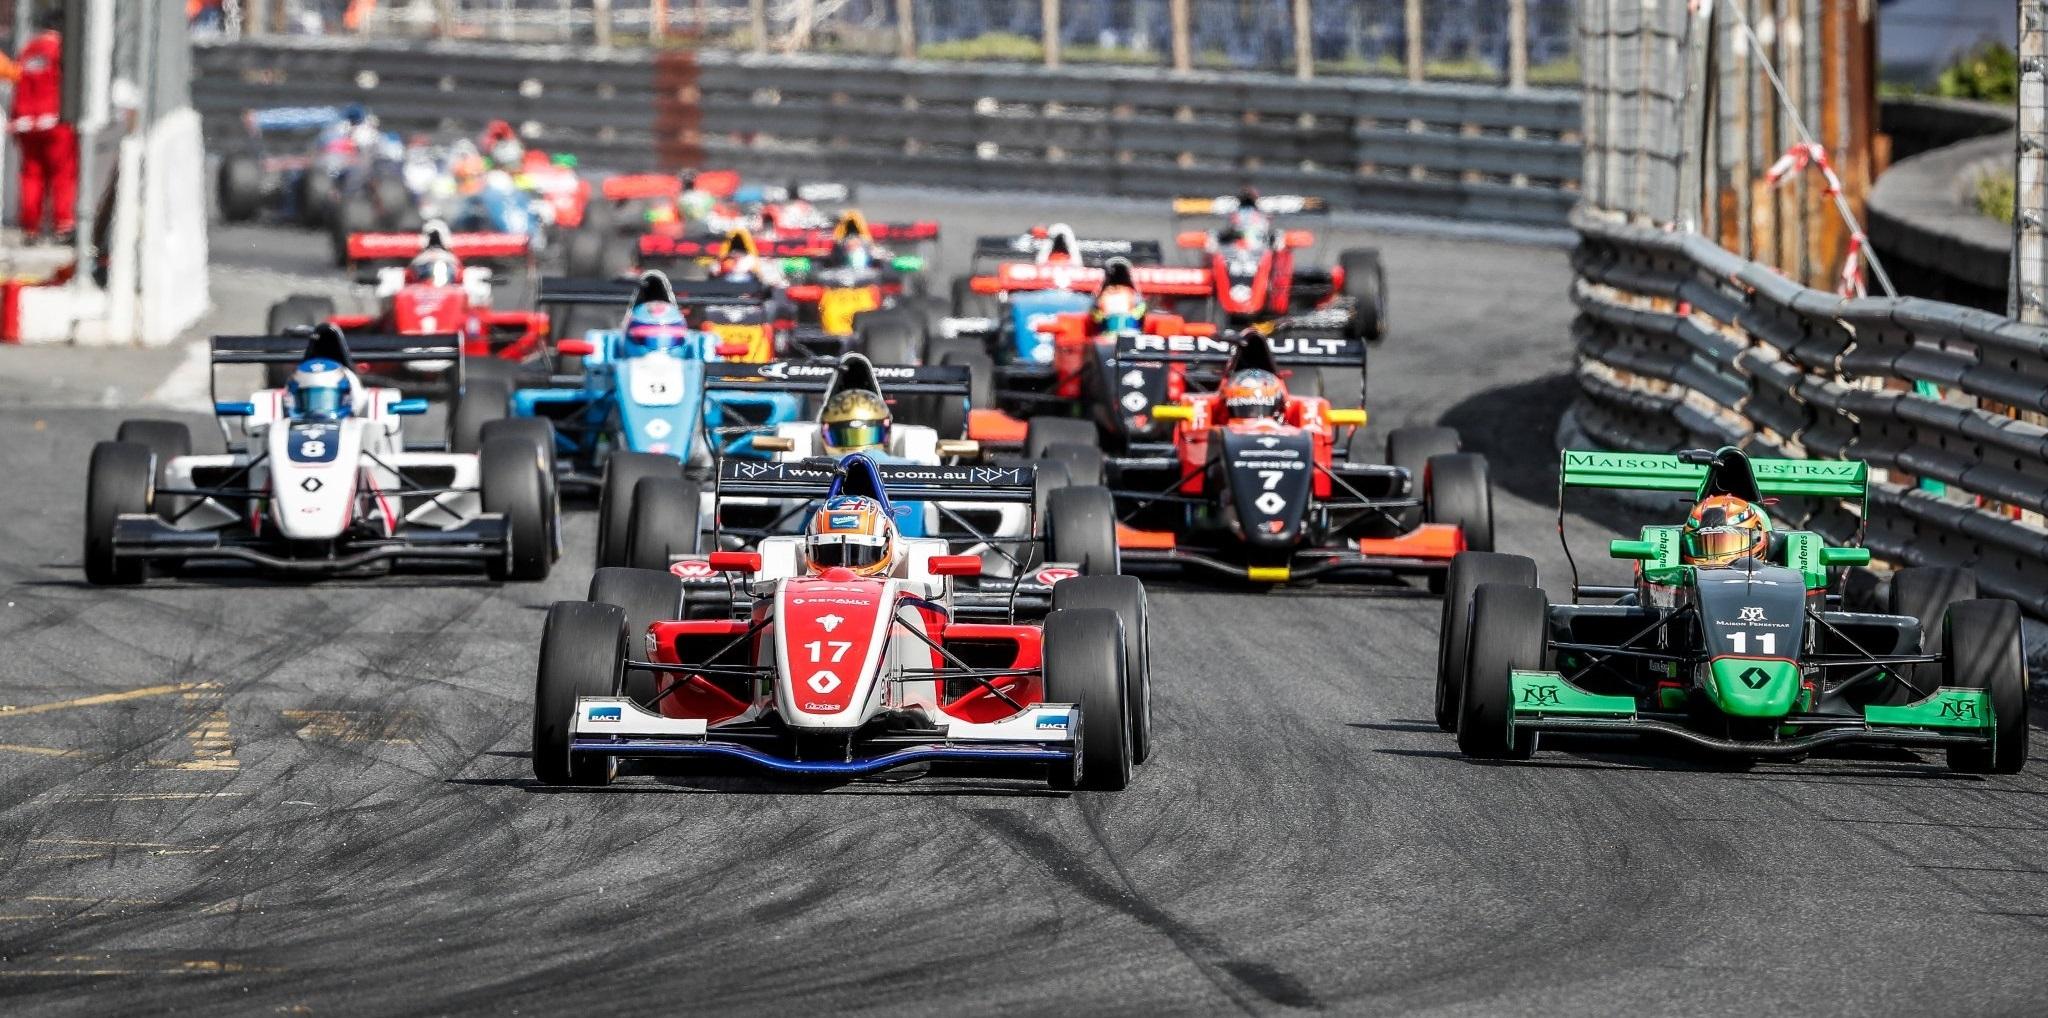 Fórmula Renault 2.0 Pau 2017